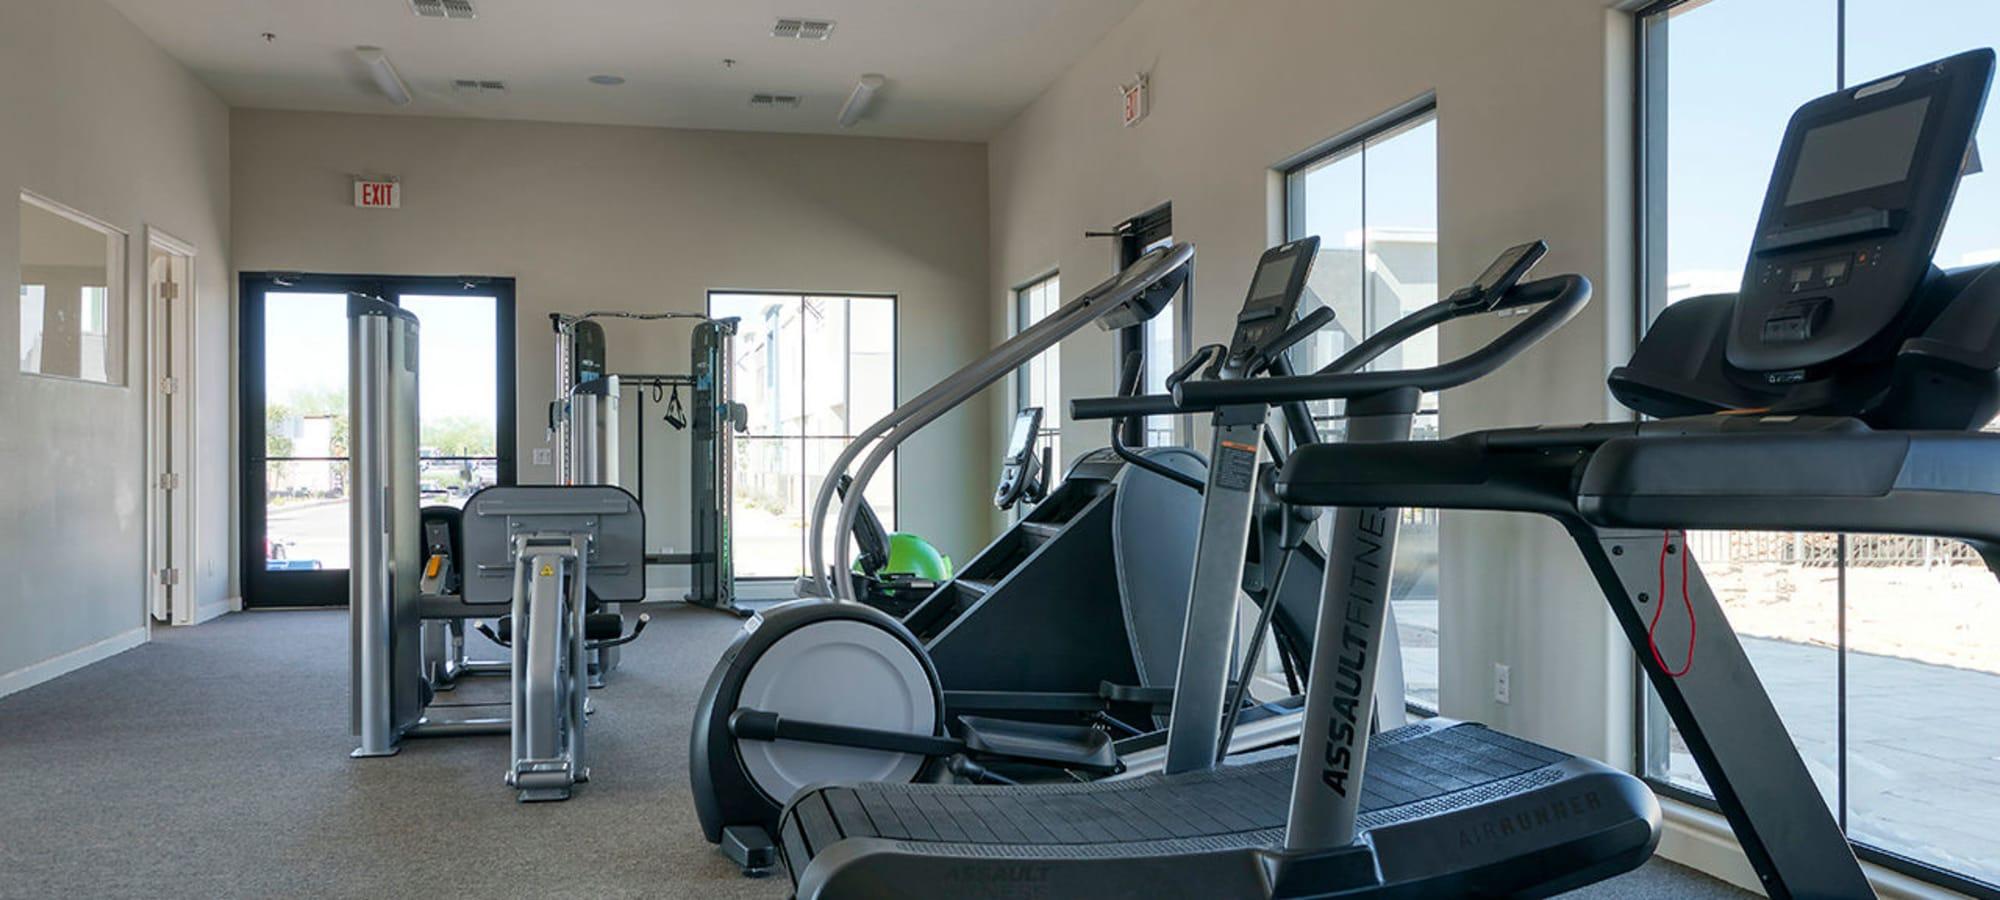 Fitness center at BB Living at Val Vista in Gilbert, Arizona